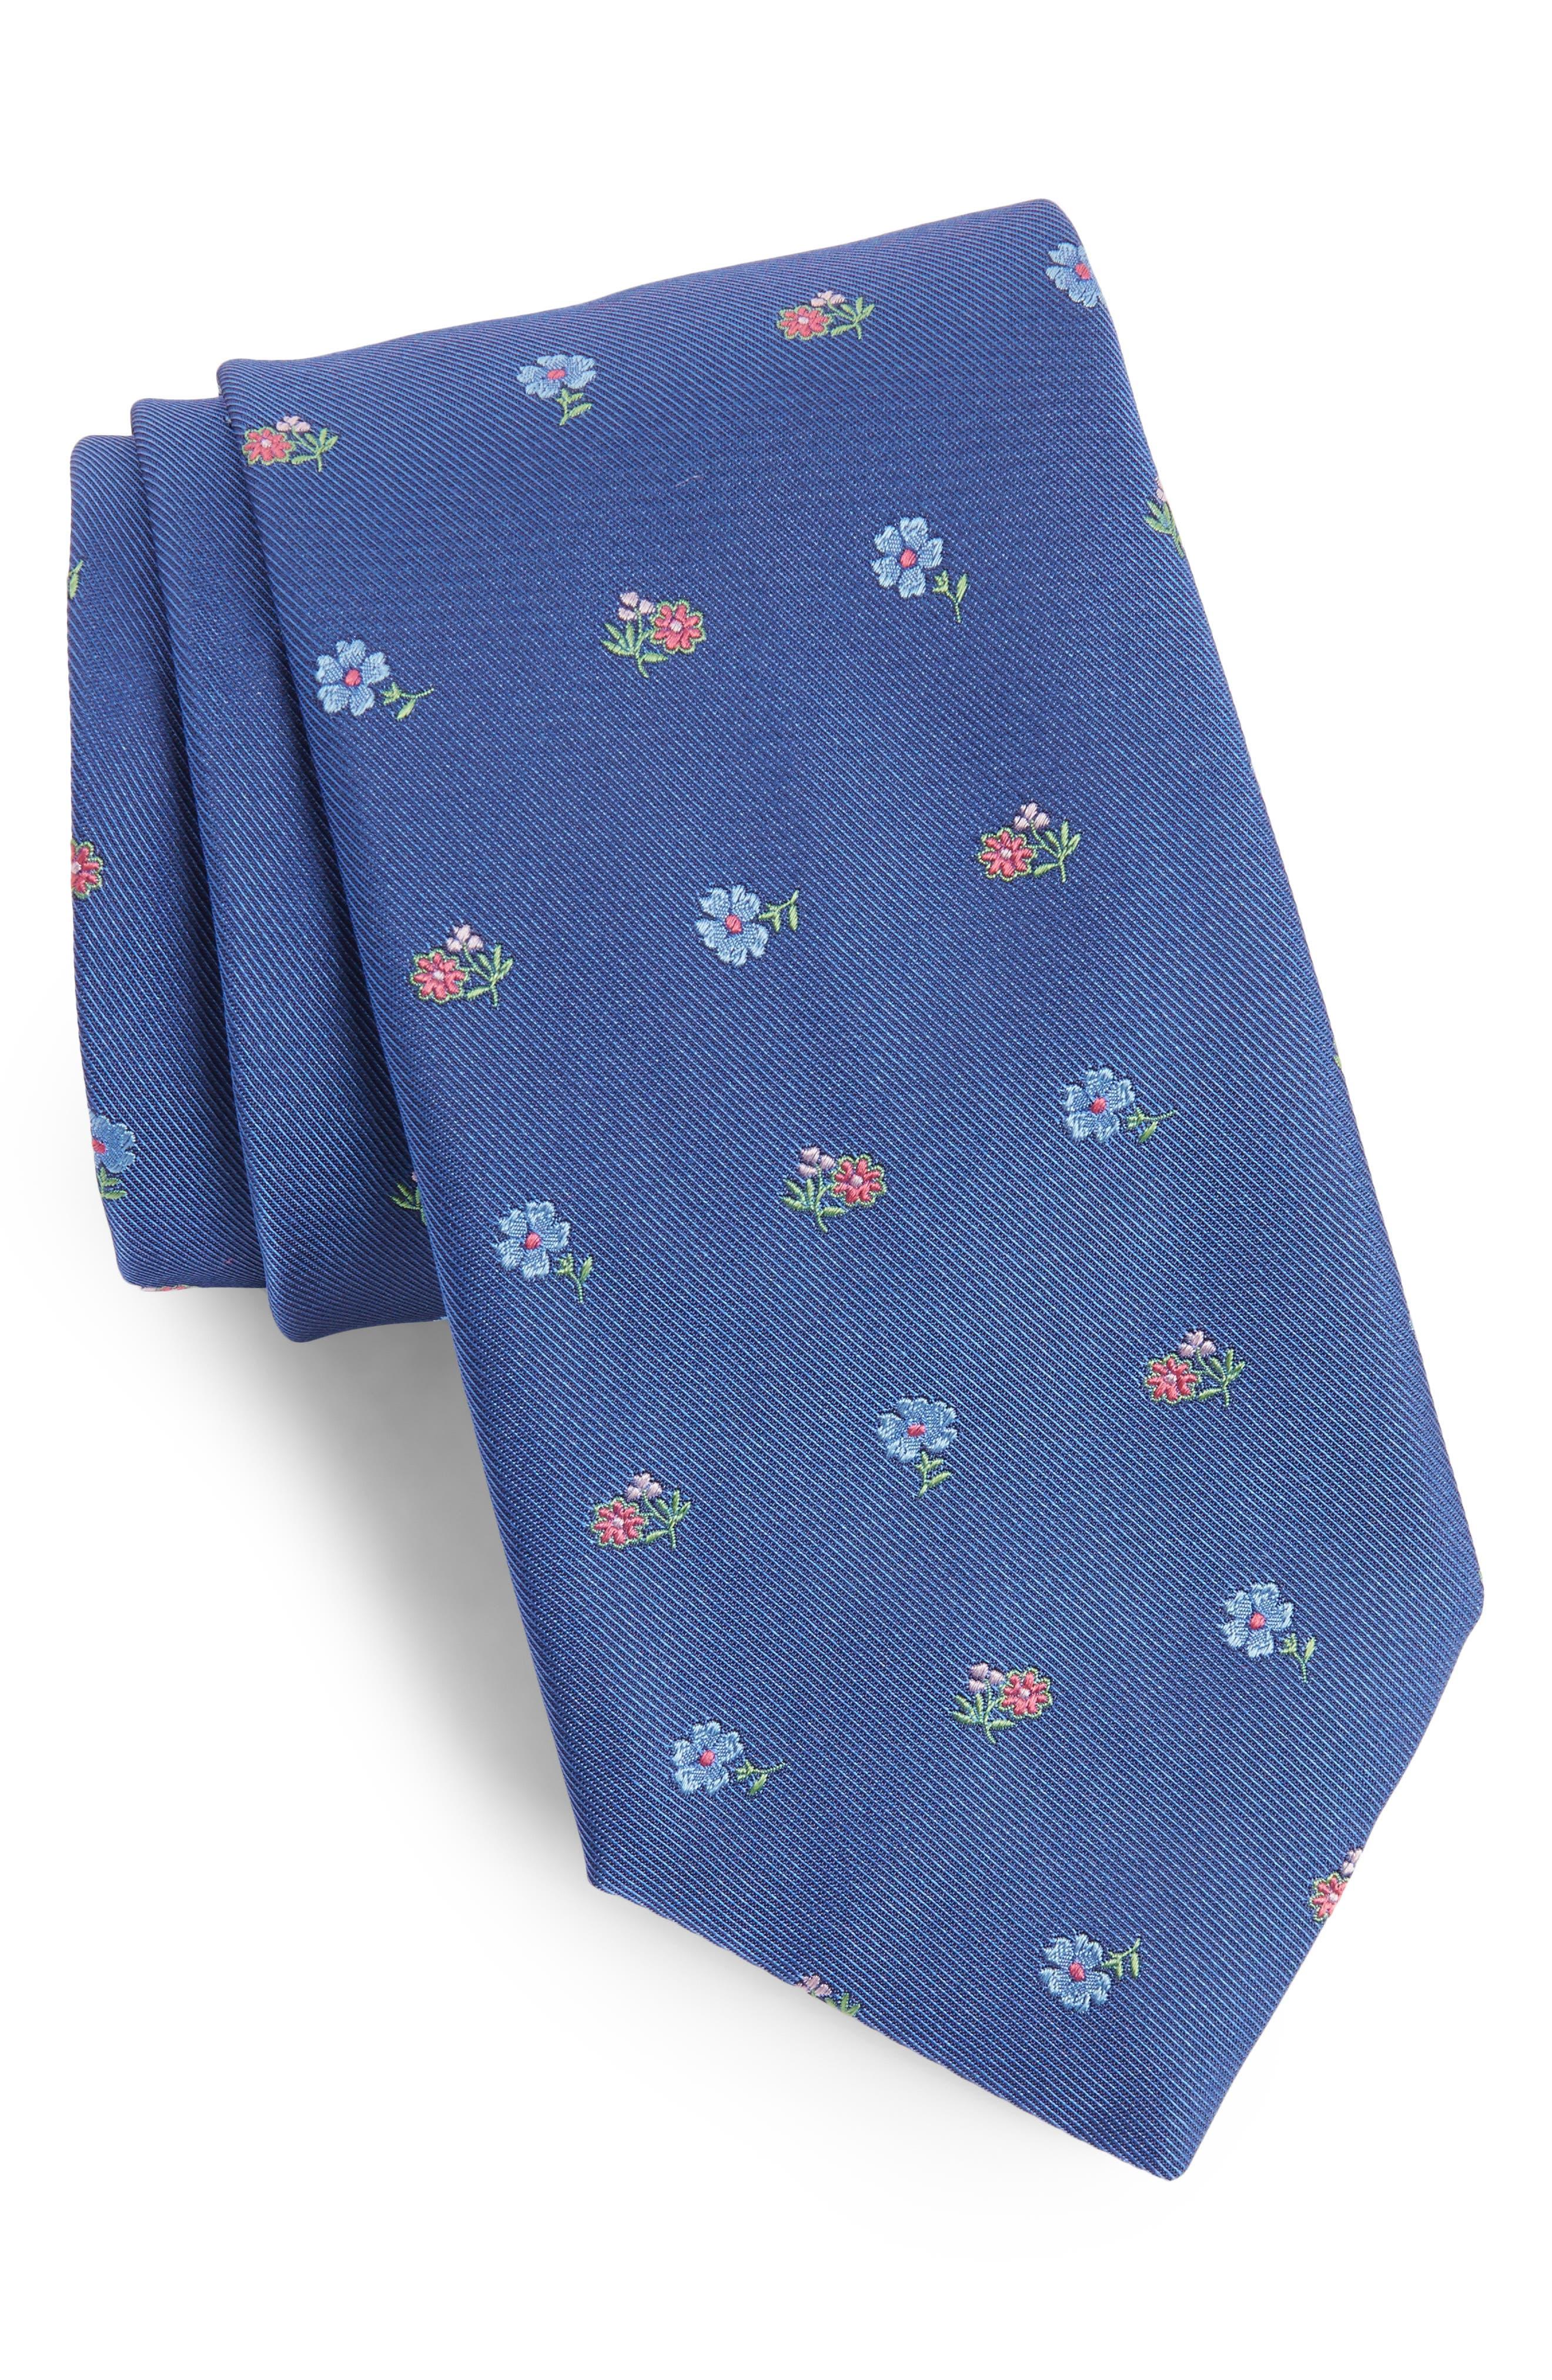 Floral Jacquard Silk Tie,                         Main,                         color, Dark Blue